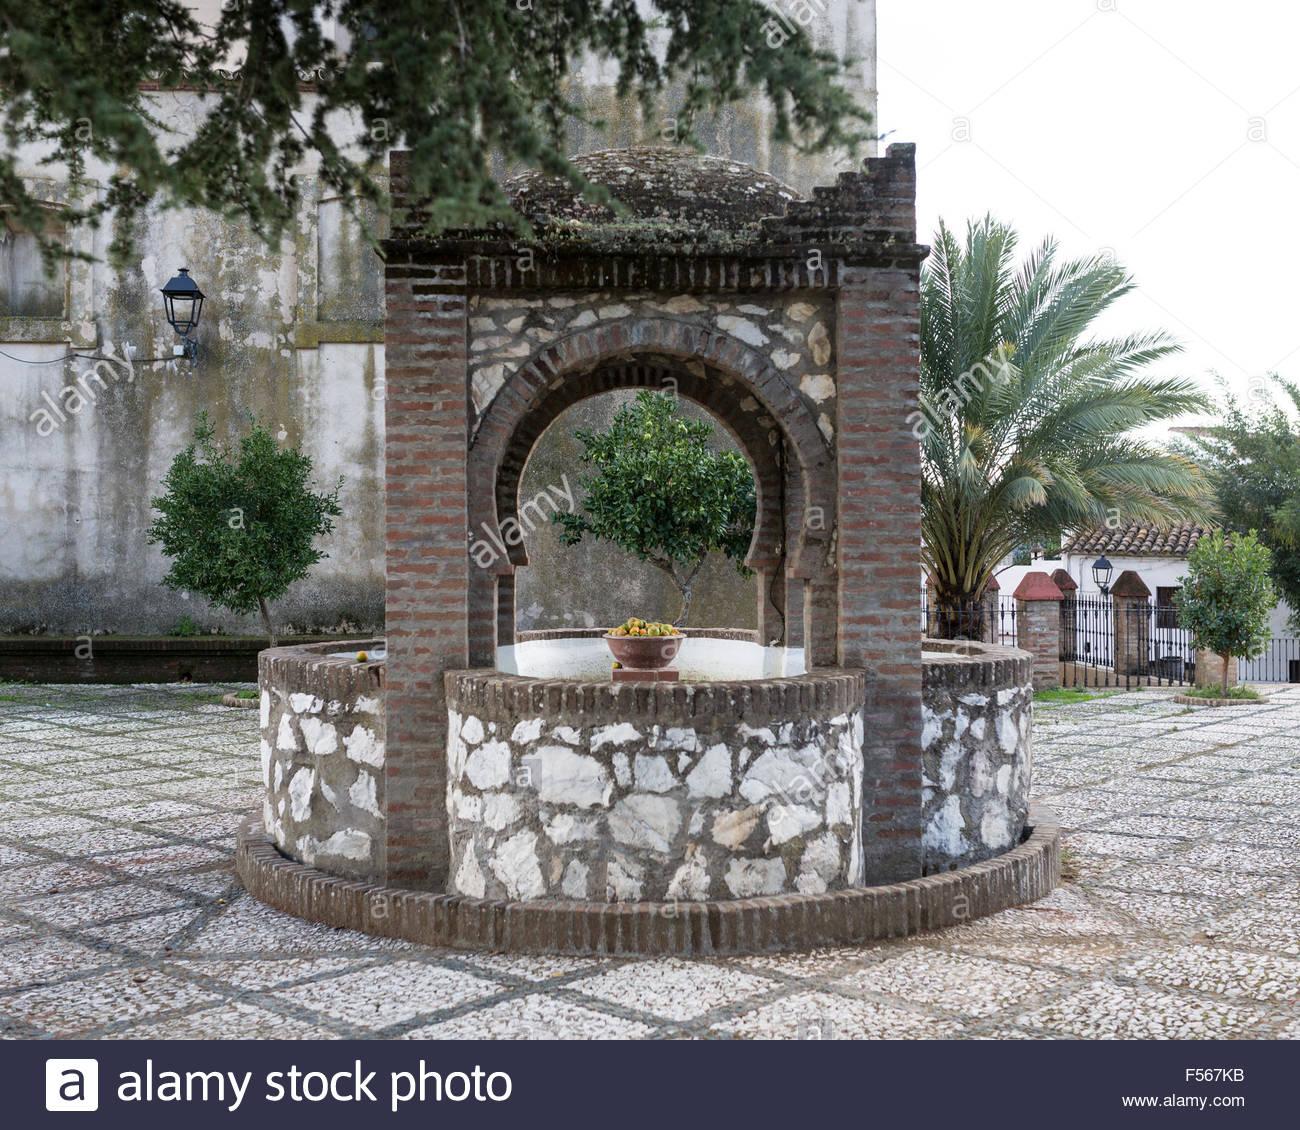 Water Well in San Juan Bautista Church courtyard in Linares, Sierra de Huelva, Andalusia Spain - Stock Image